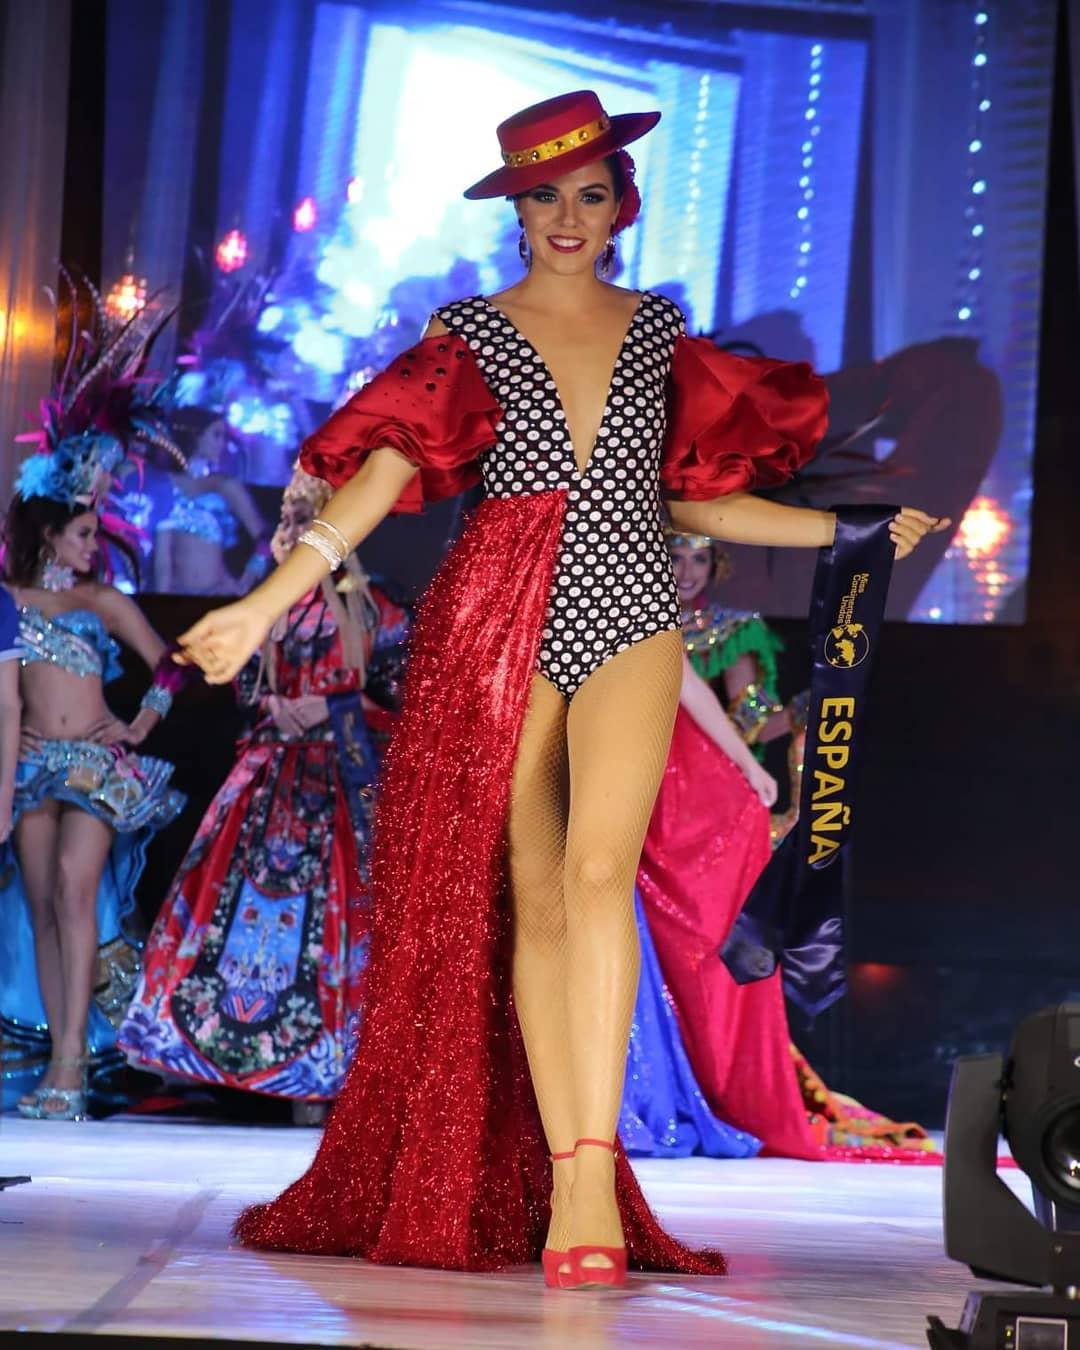 cynthia ruz lopez escobar, 3rd runner-up de miss continentes unidos 2018. - Página 3 41149210